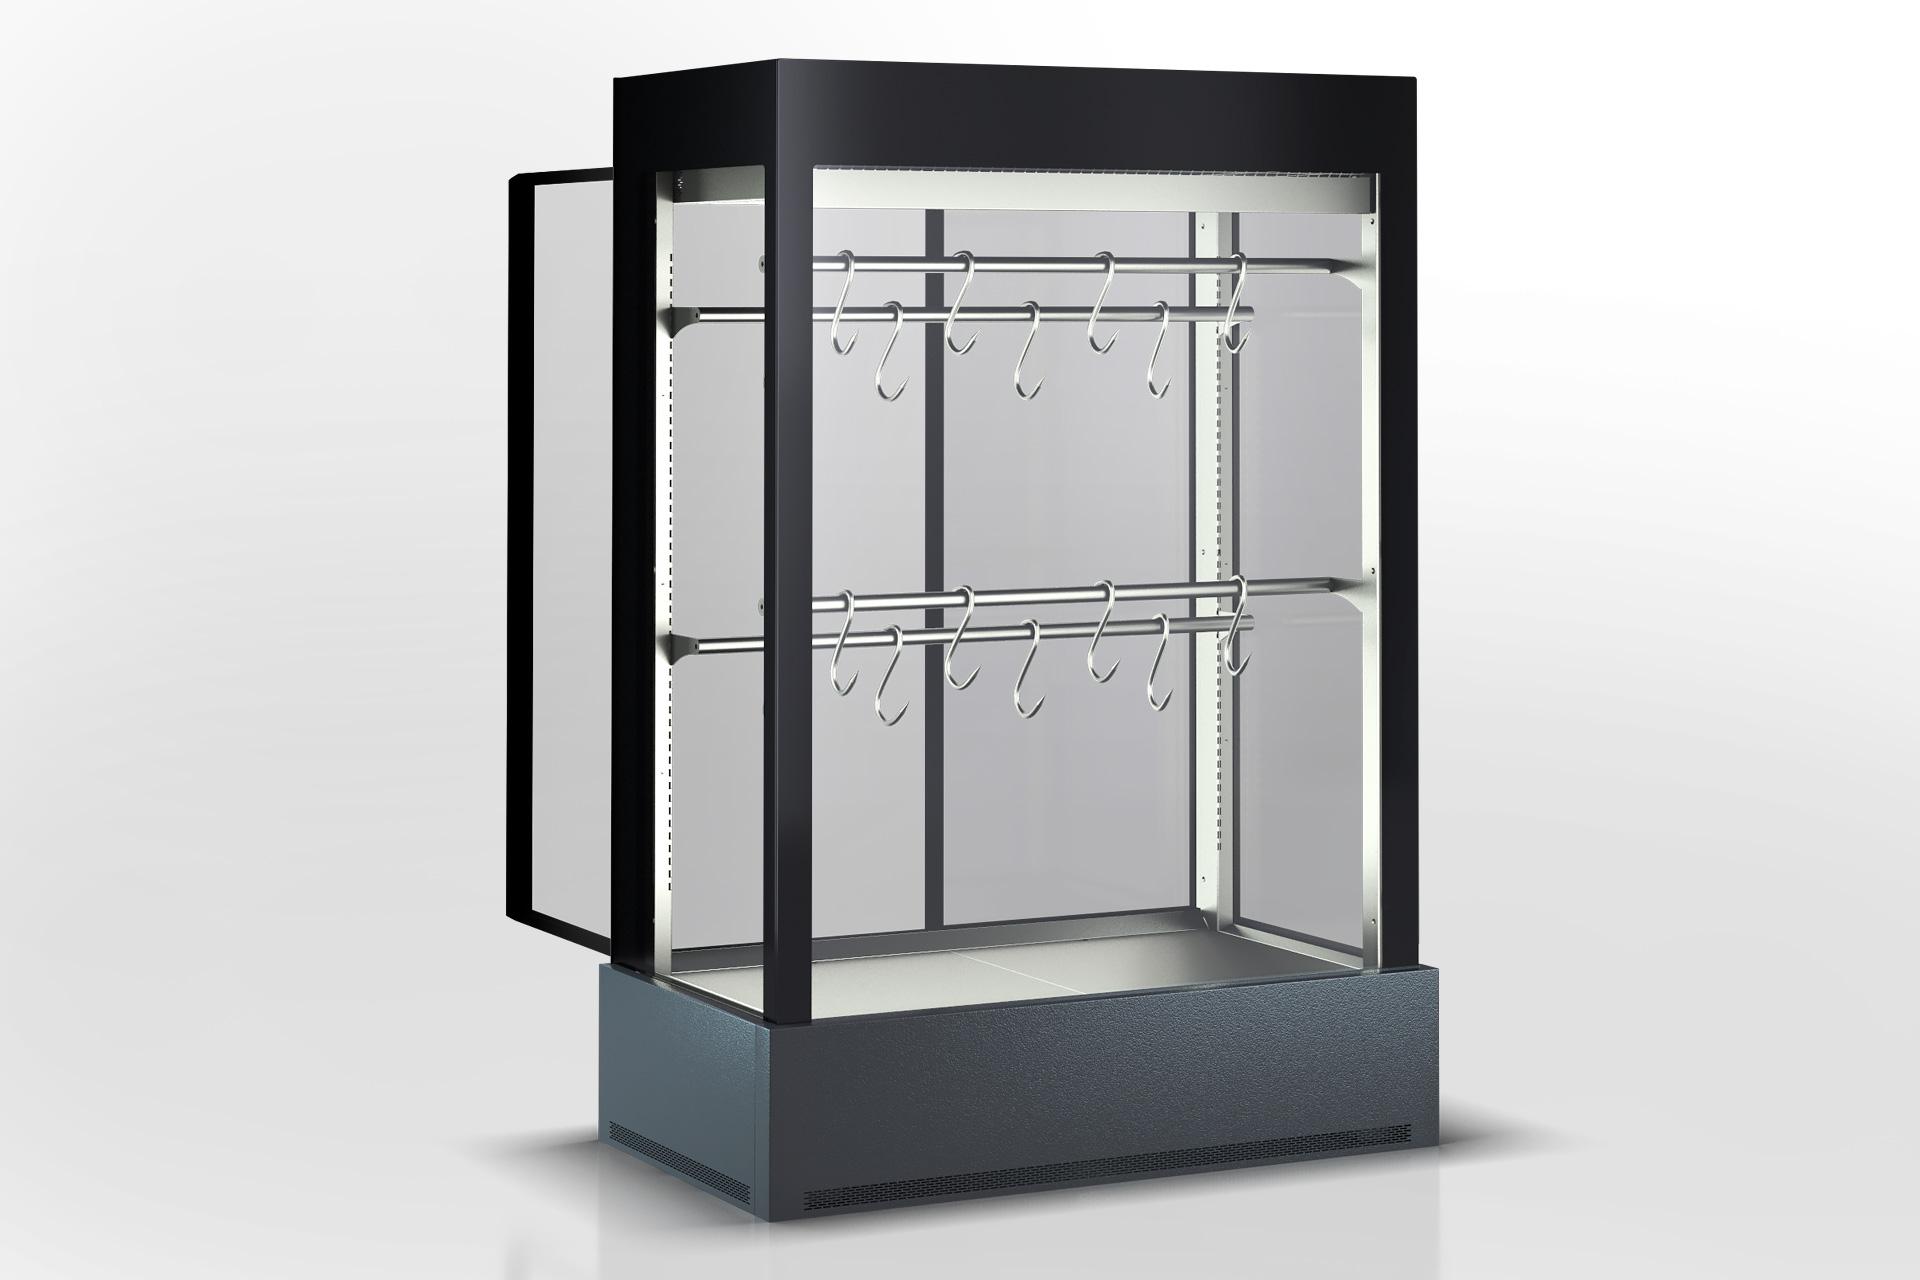 Refrigerated cabinets</p> <div>Kansas А4SG 078 meat 2HD</div> <div>210-S1000A-135</div> <p>(option)